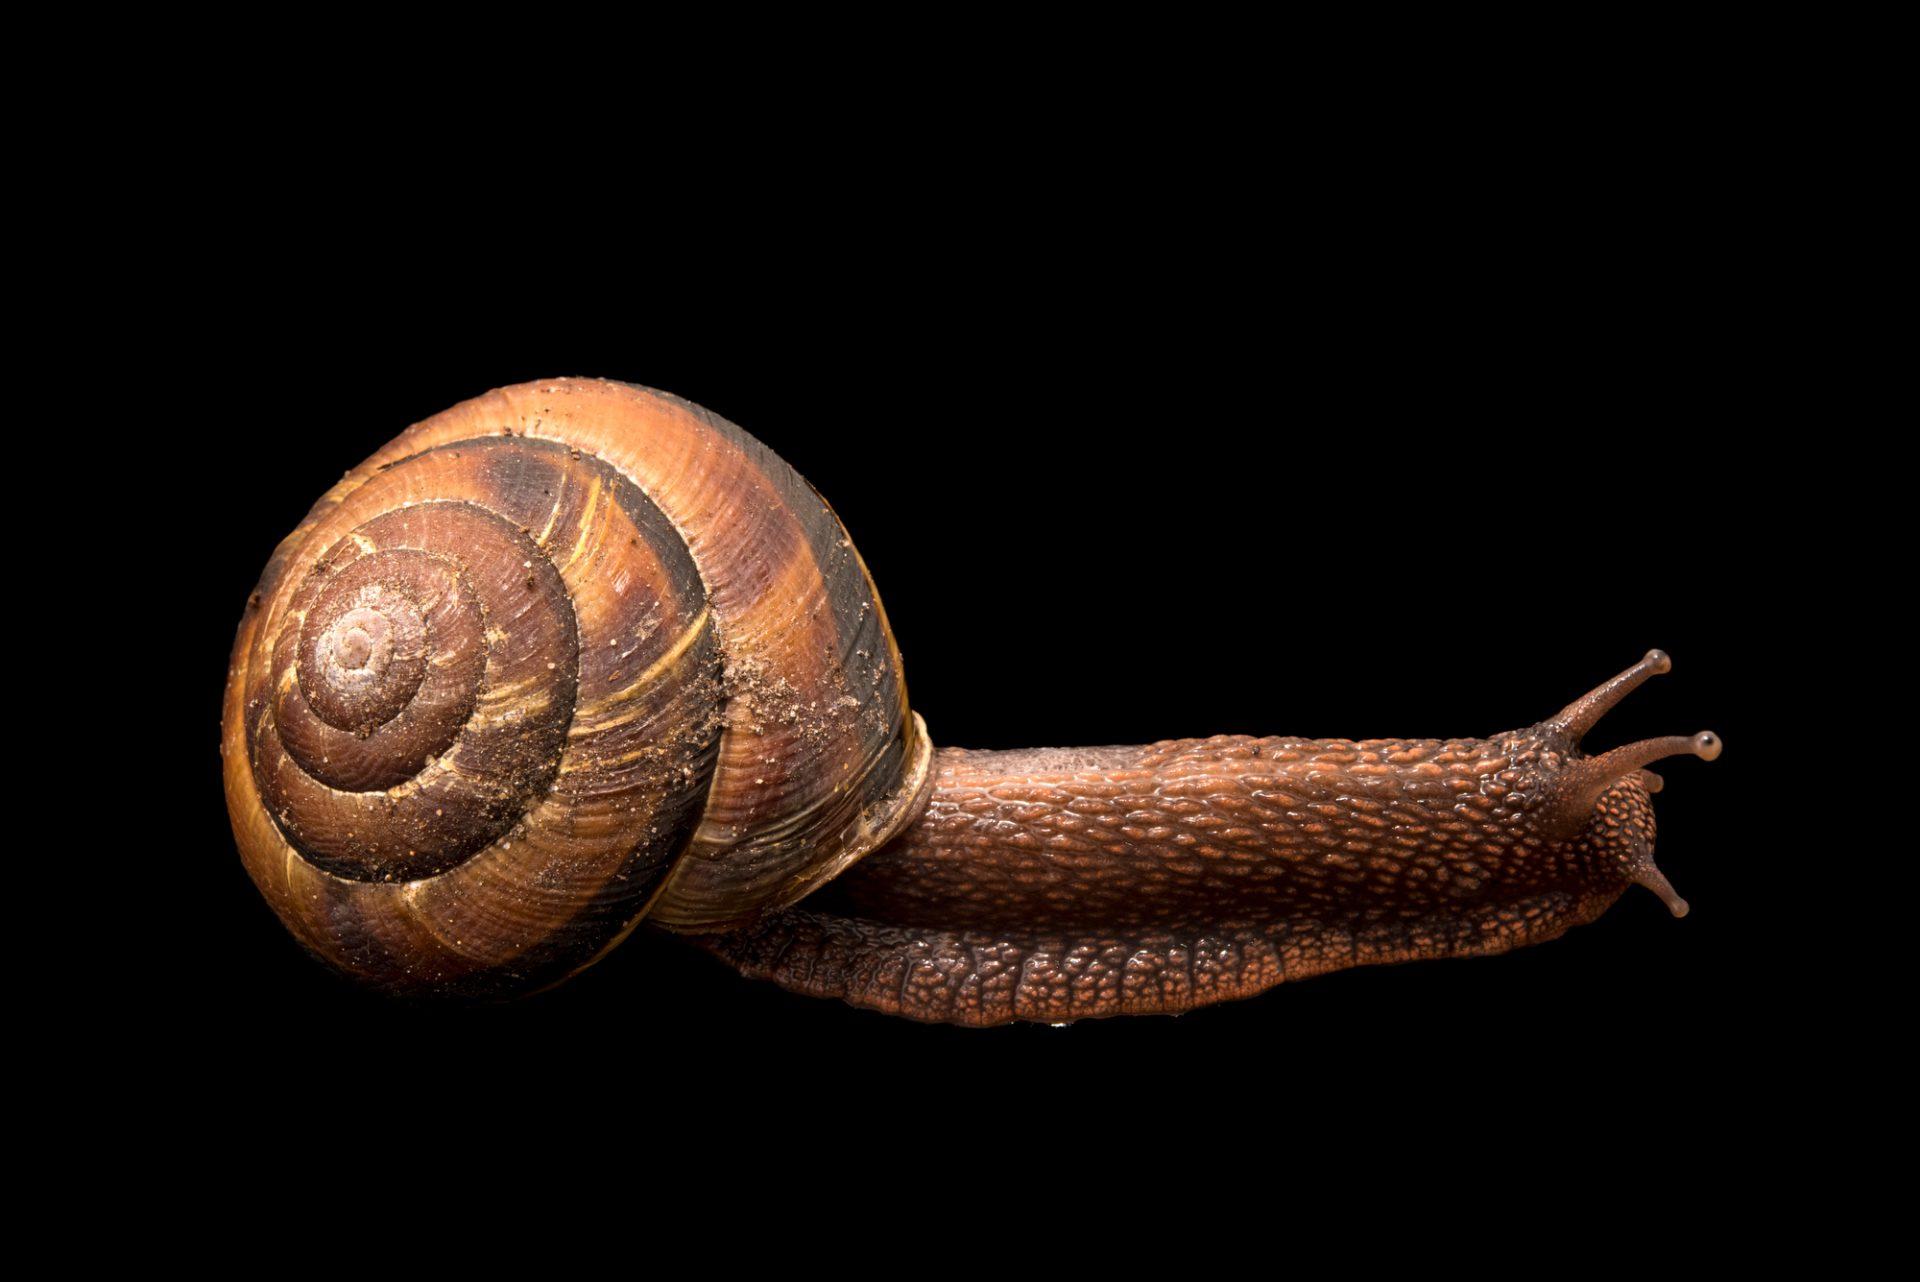 Photo: Pacific sideband snail (Monadenia fidelis) at the Trinity Western University.